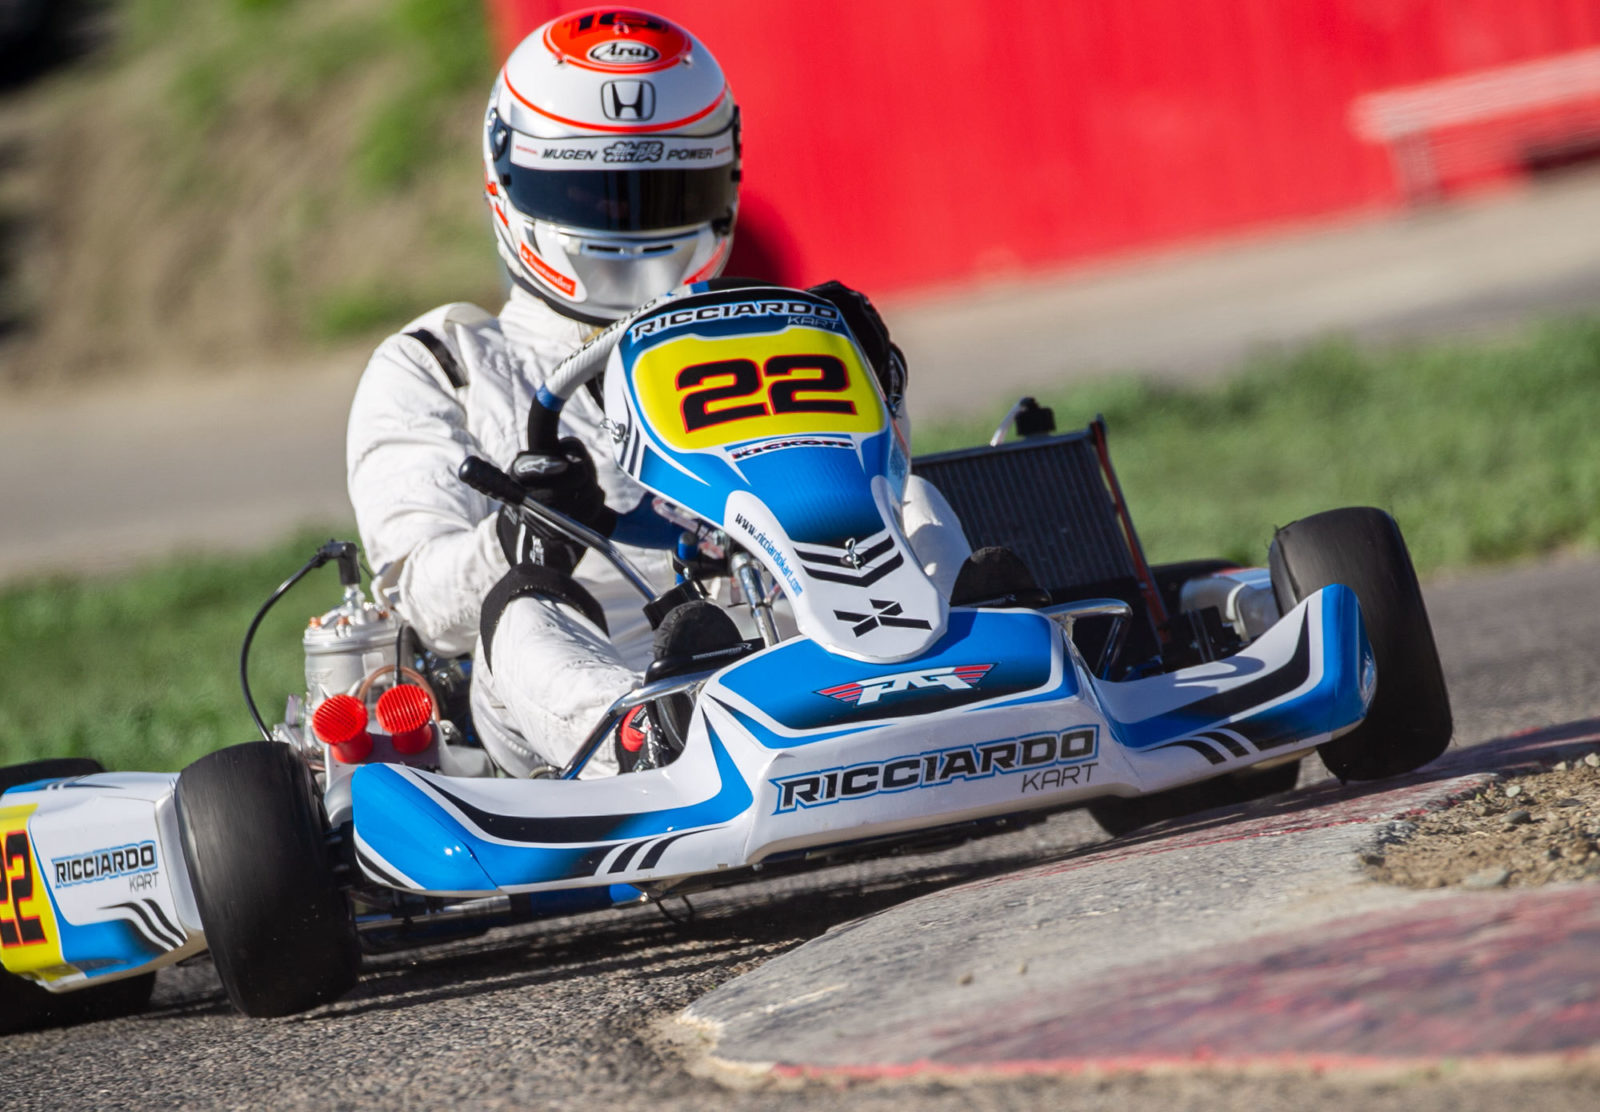 Jenson Button driving ROK Shifter on a Ricciardo Kart